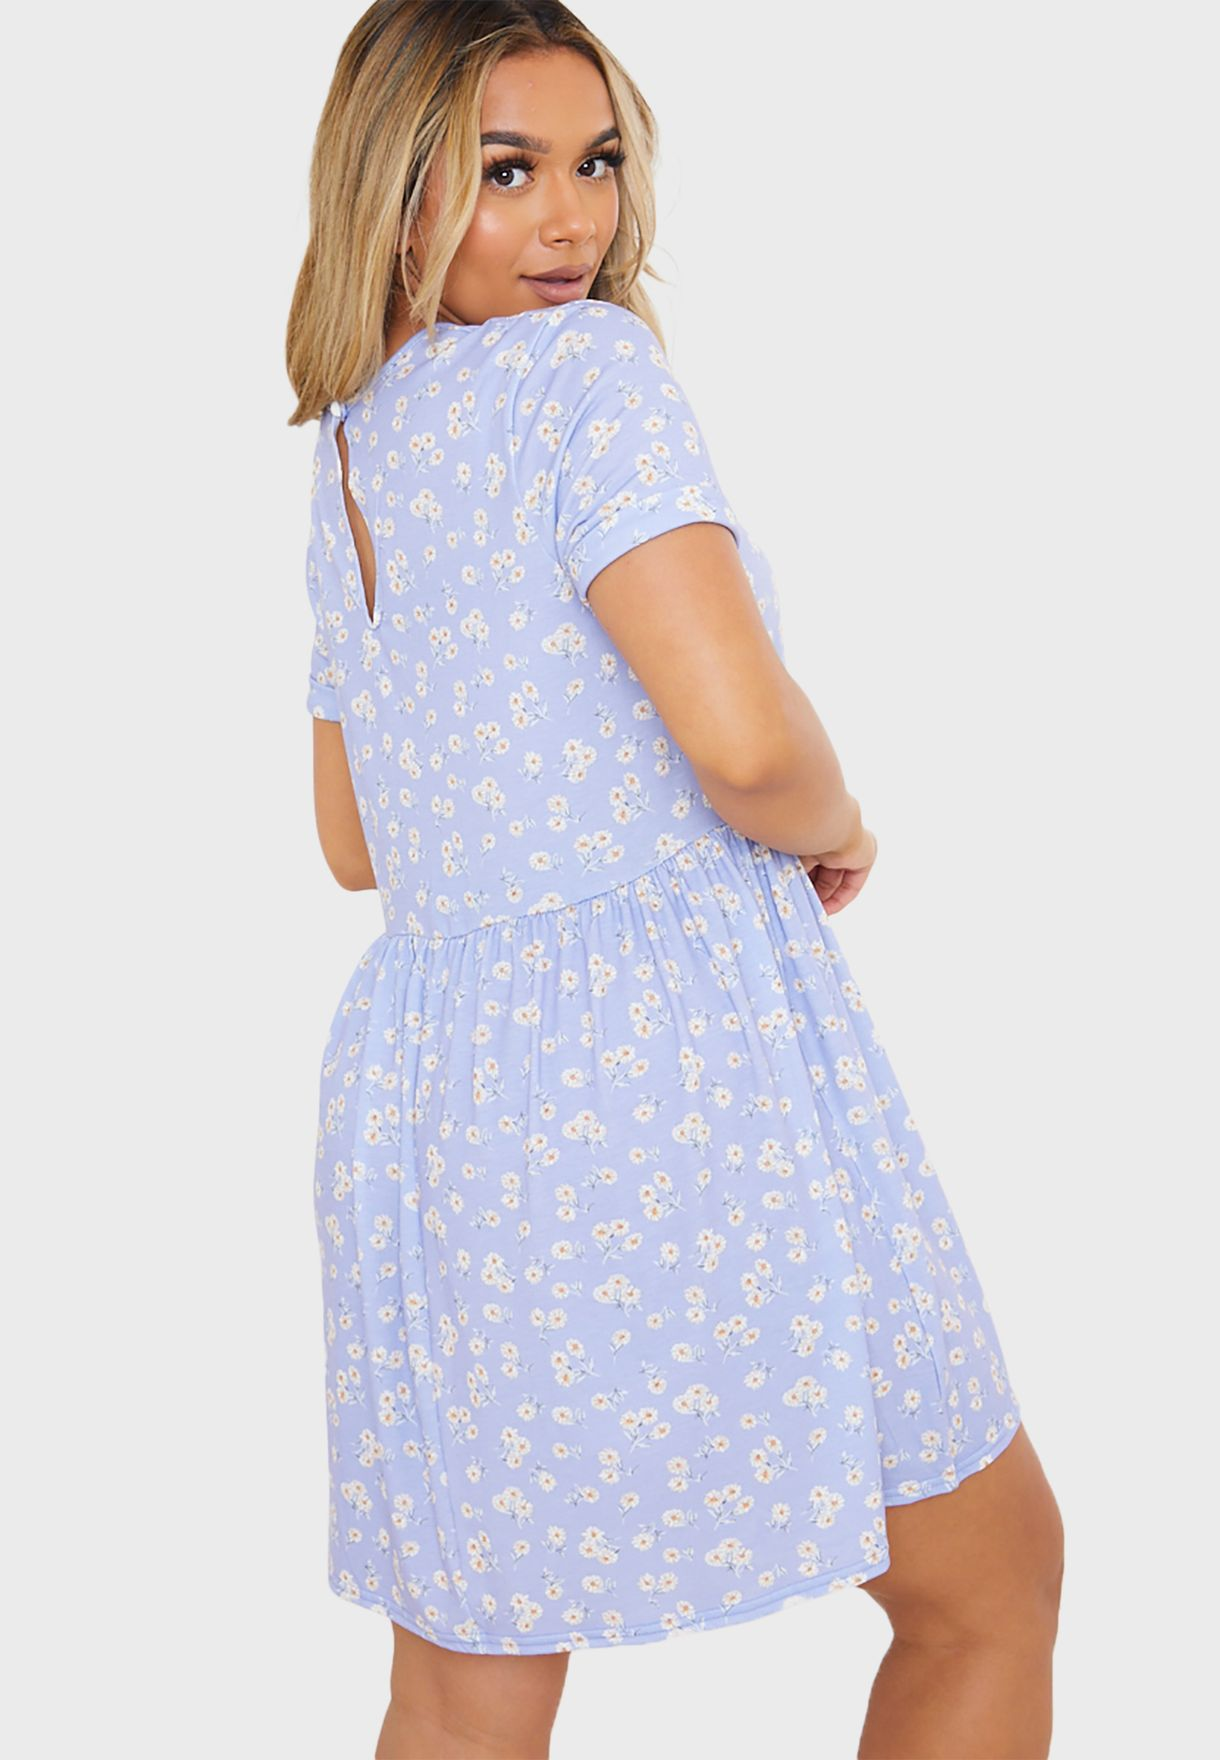 Floral Cap Sleeve Smock Mini Dress